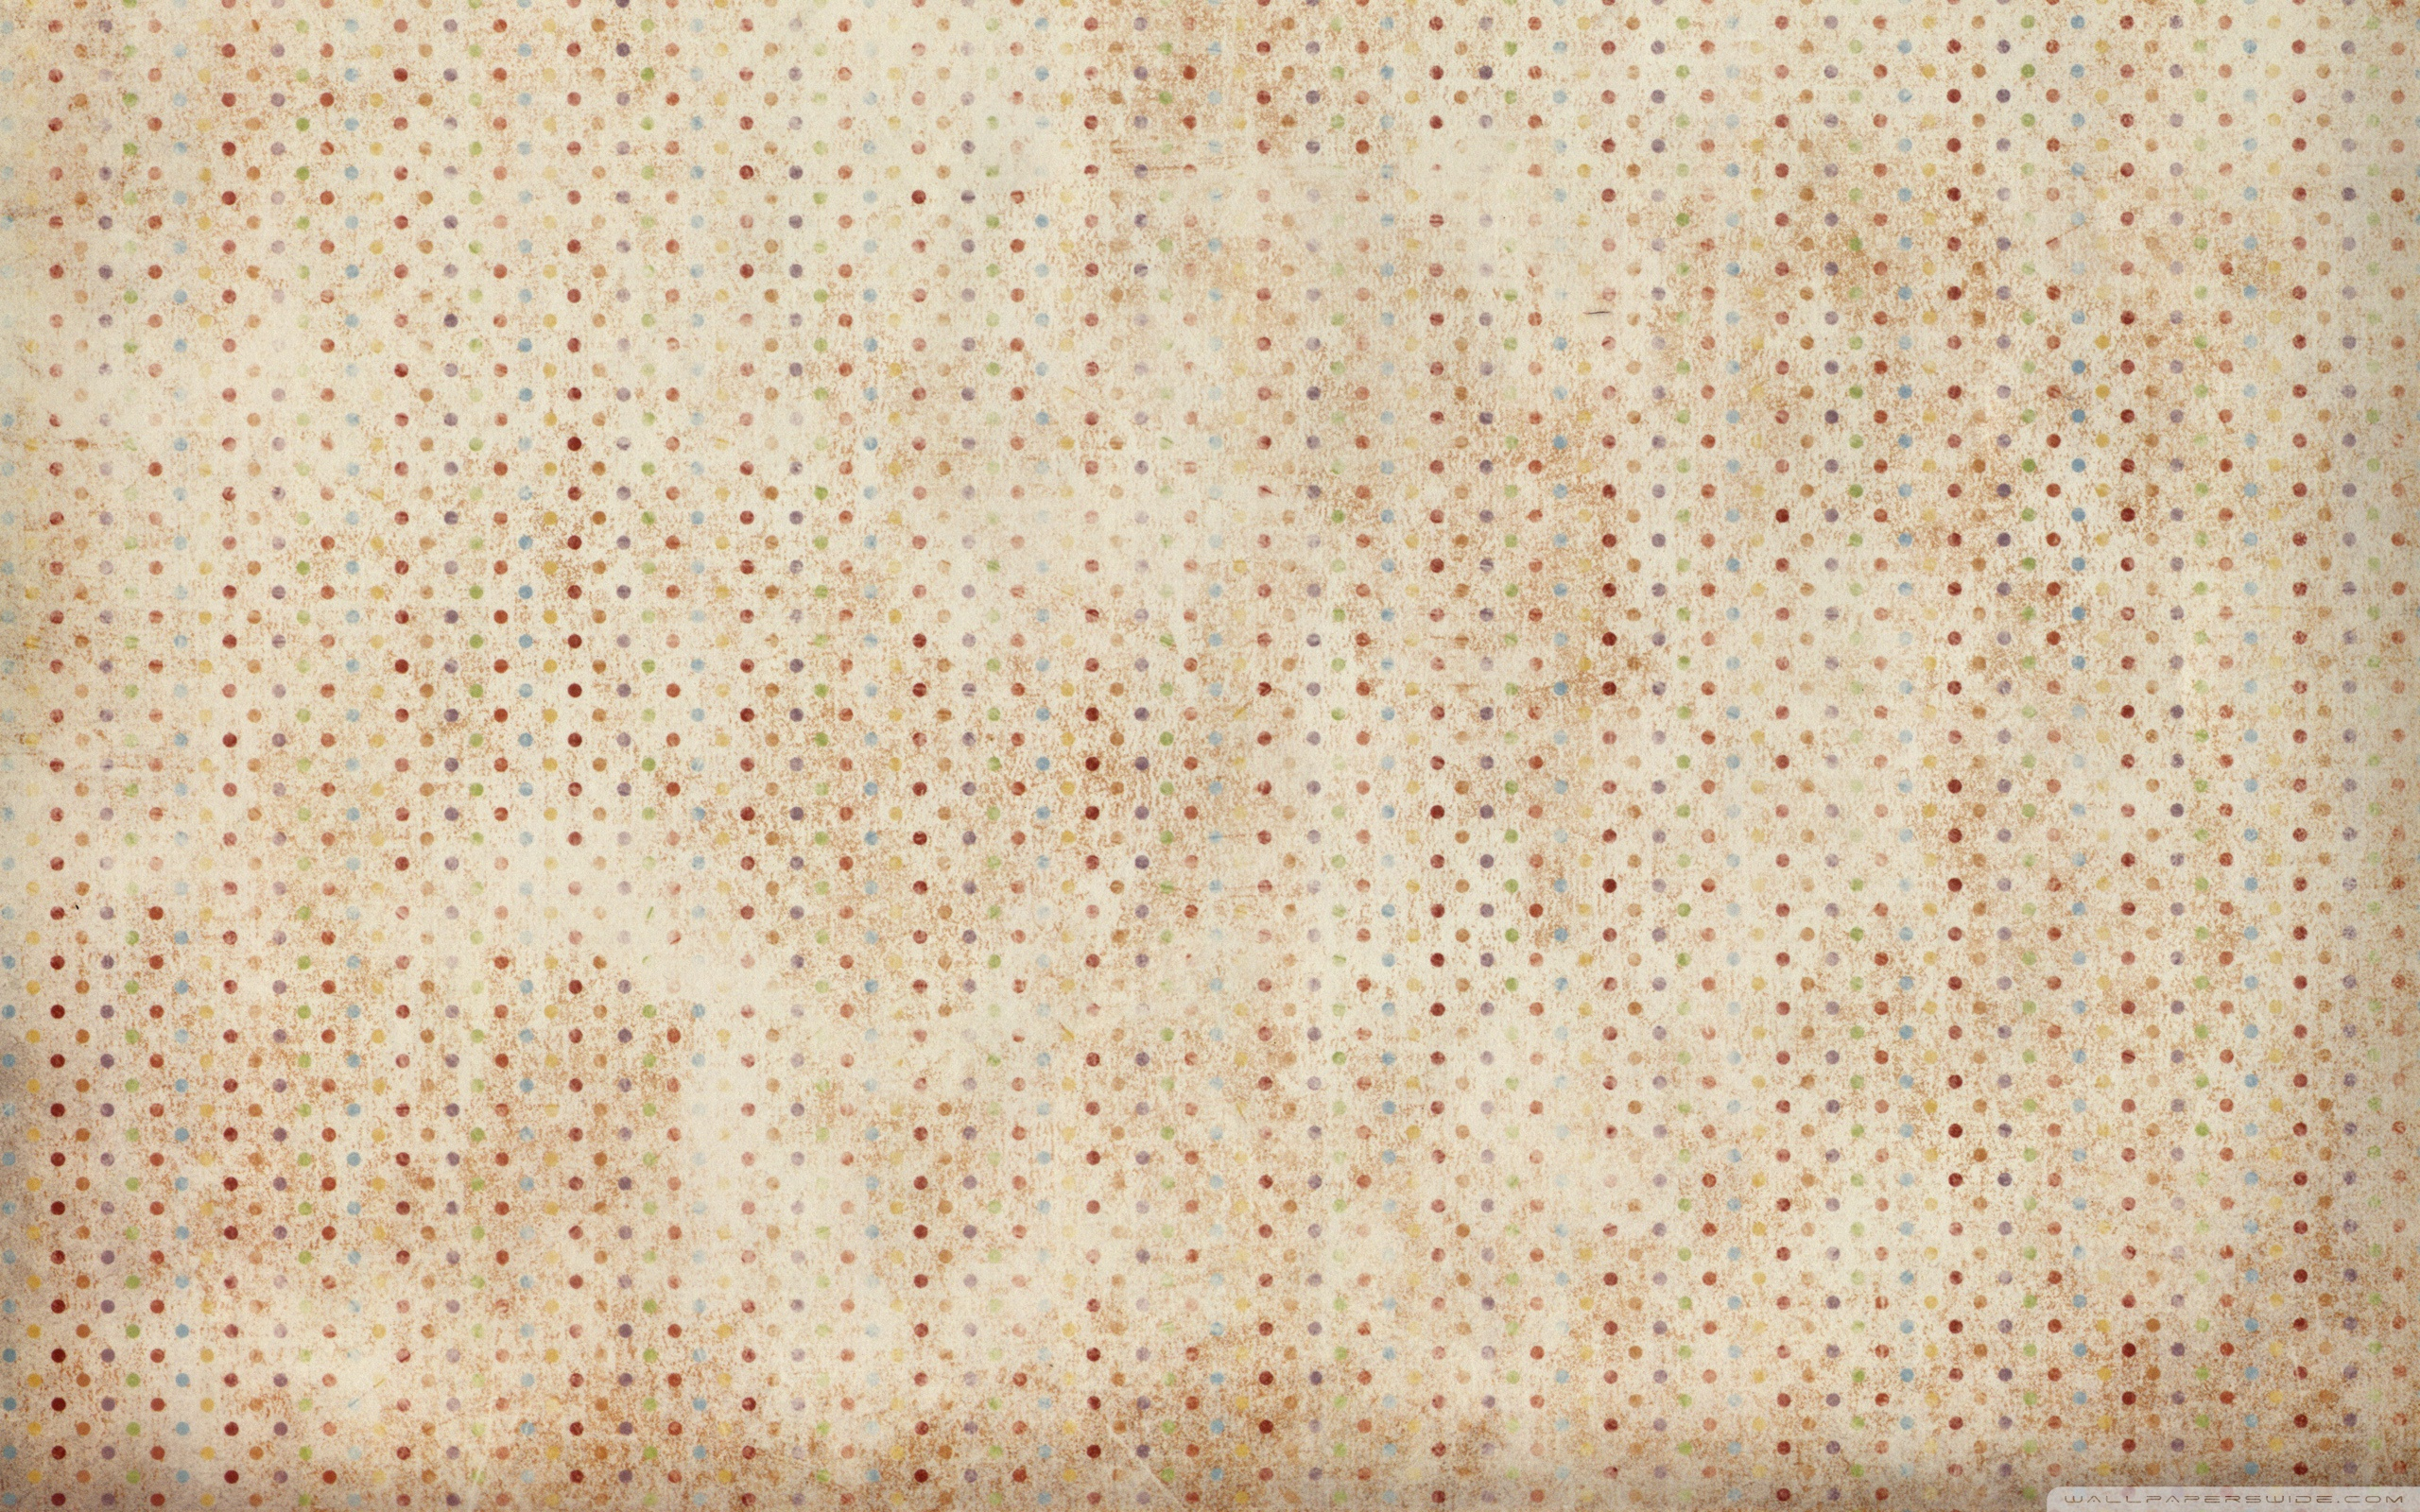 Halloween Vintage Texture   VIP Wallpaper   HD Wallpapers for ...